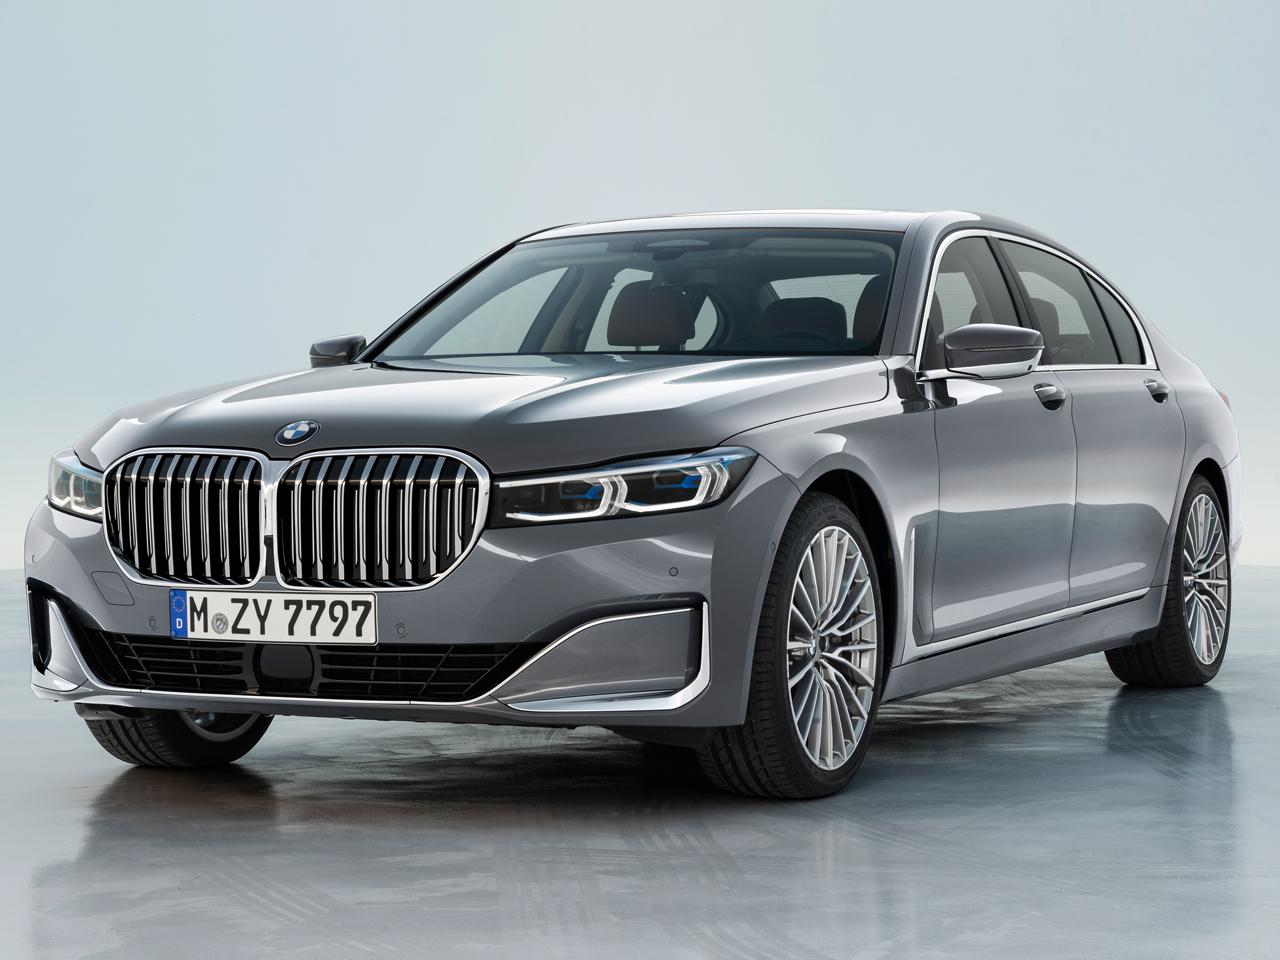 BMW 7シリーズ セダン 2015年モデル 新車画像